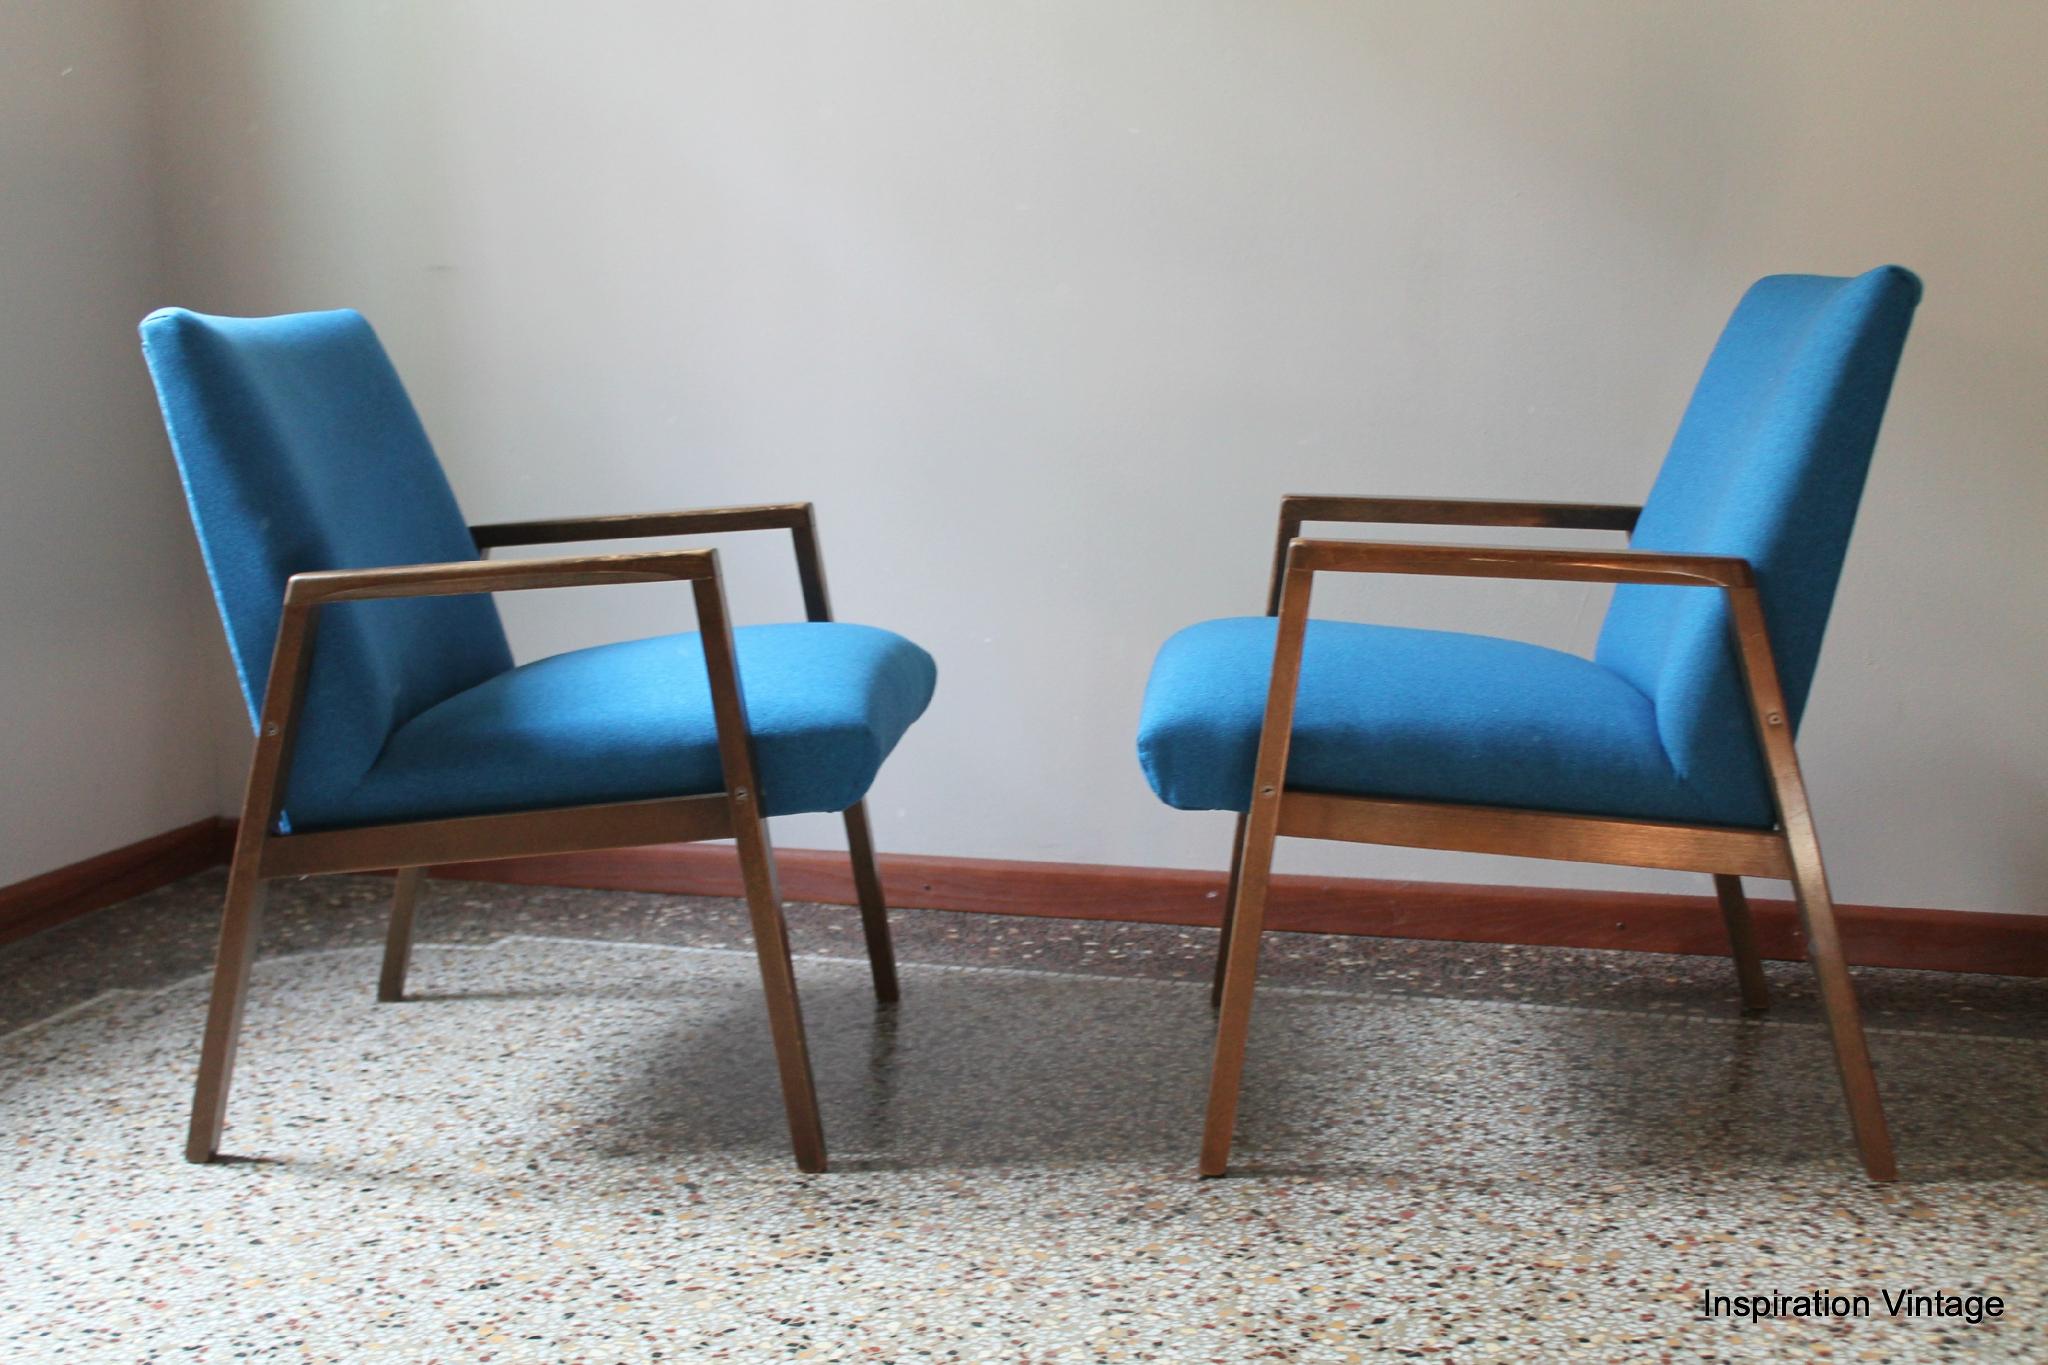 Fauteuils design Scandinave 70 S Bleu Inspiration Vintage